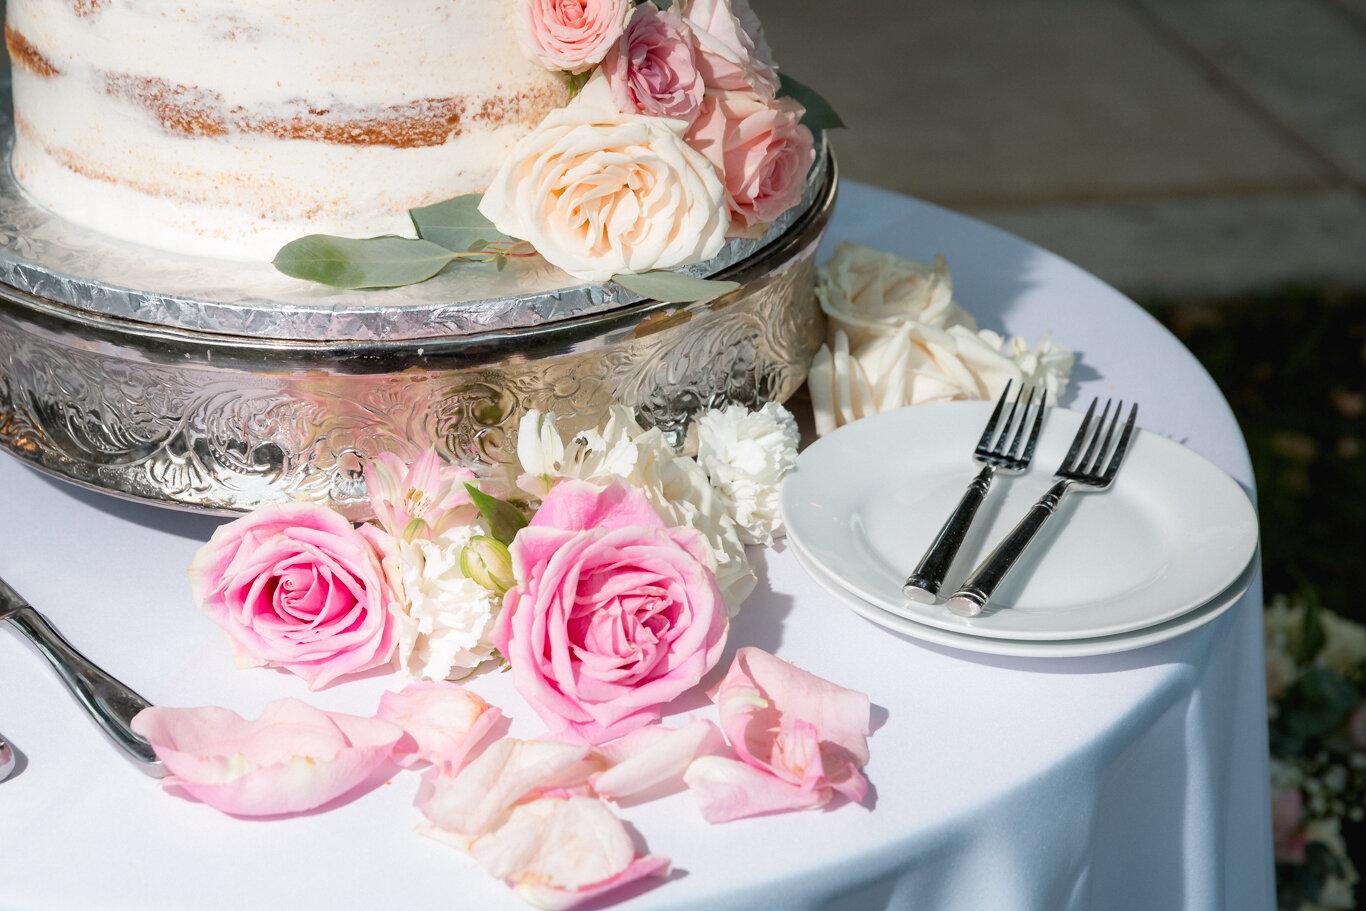 2019.08.24_Emily-Ashir-Wedding-at-the-Maples-6285.jpg